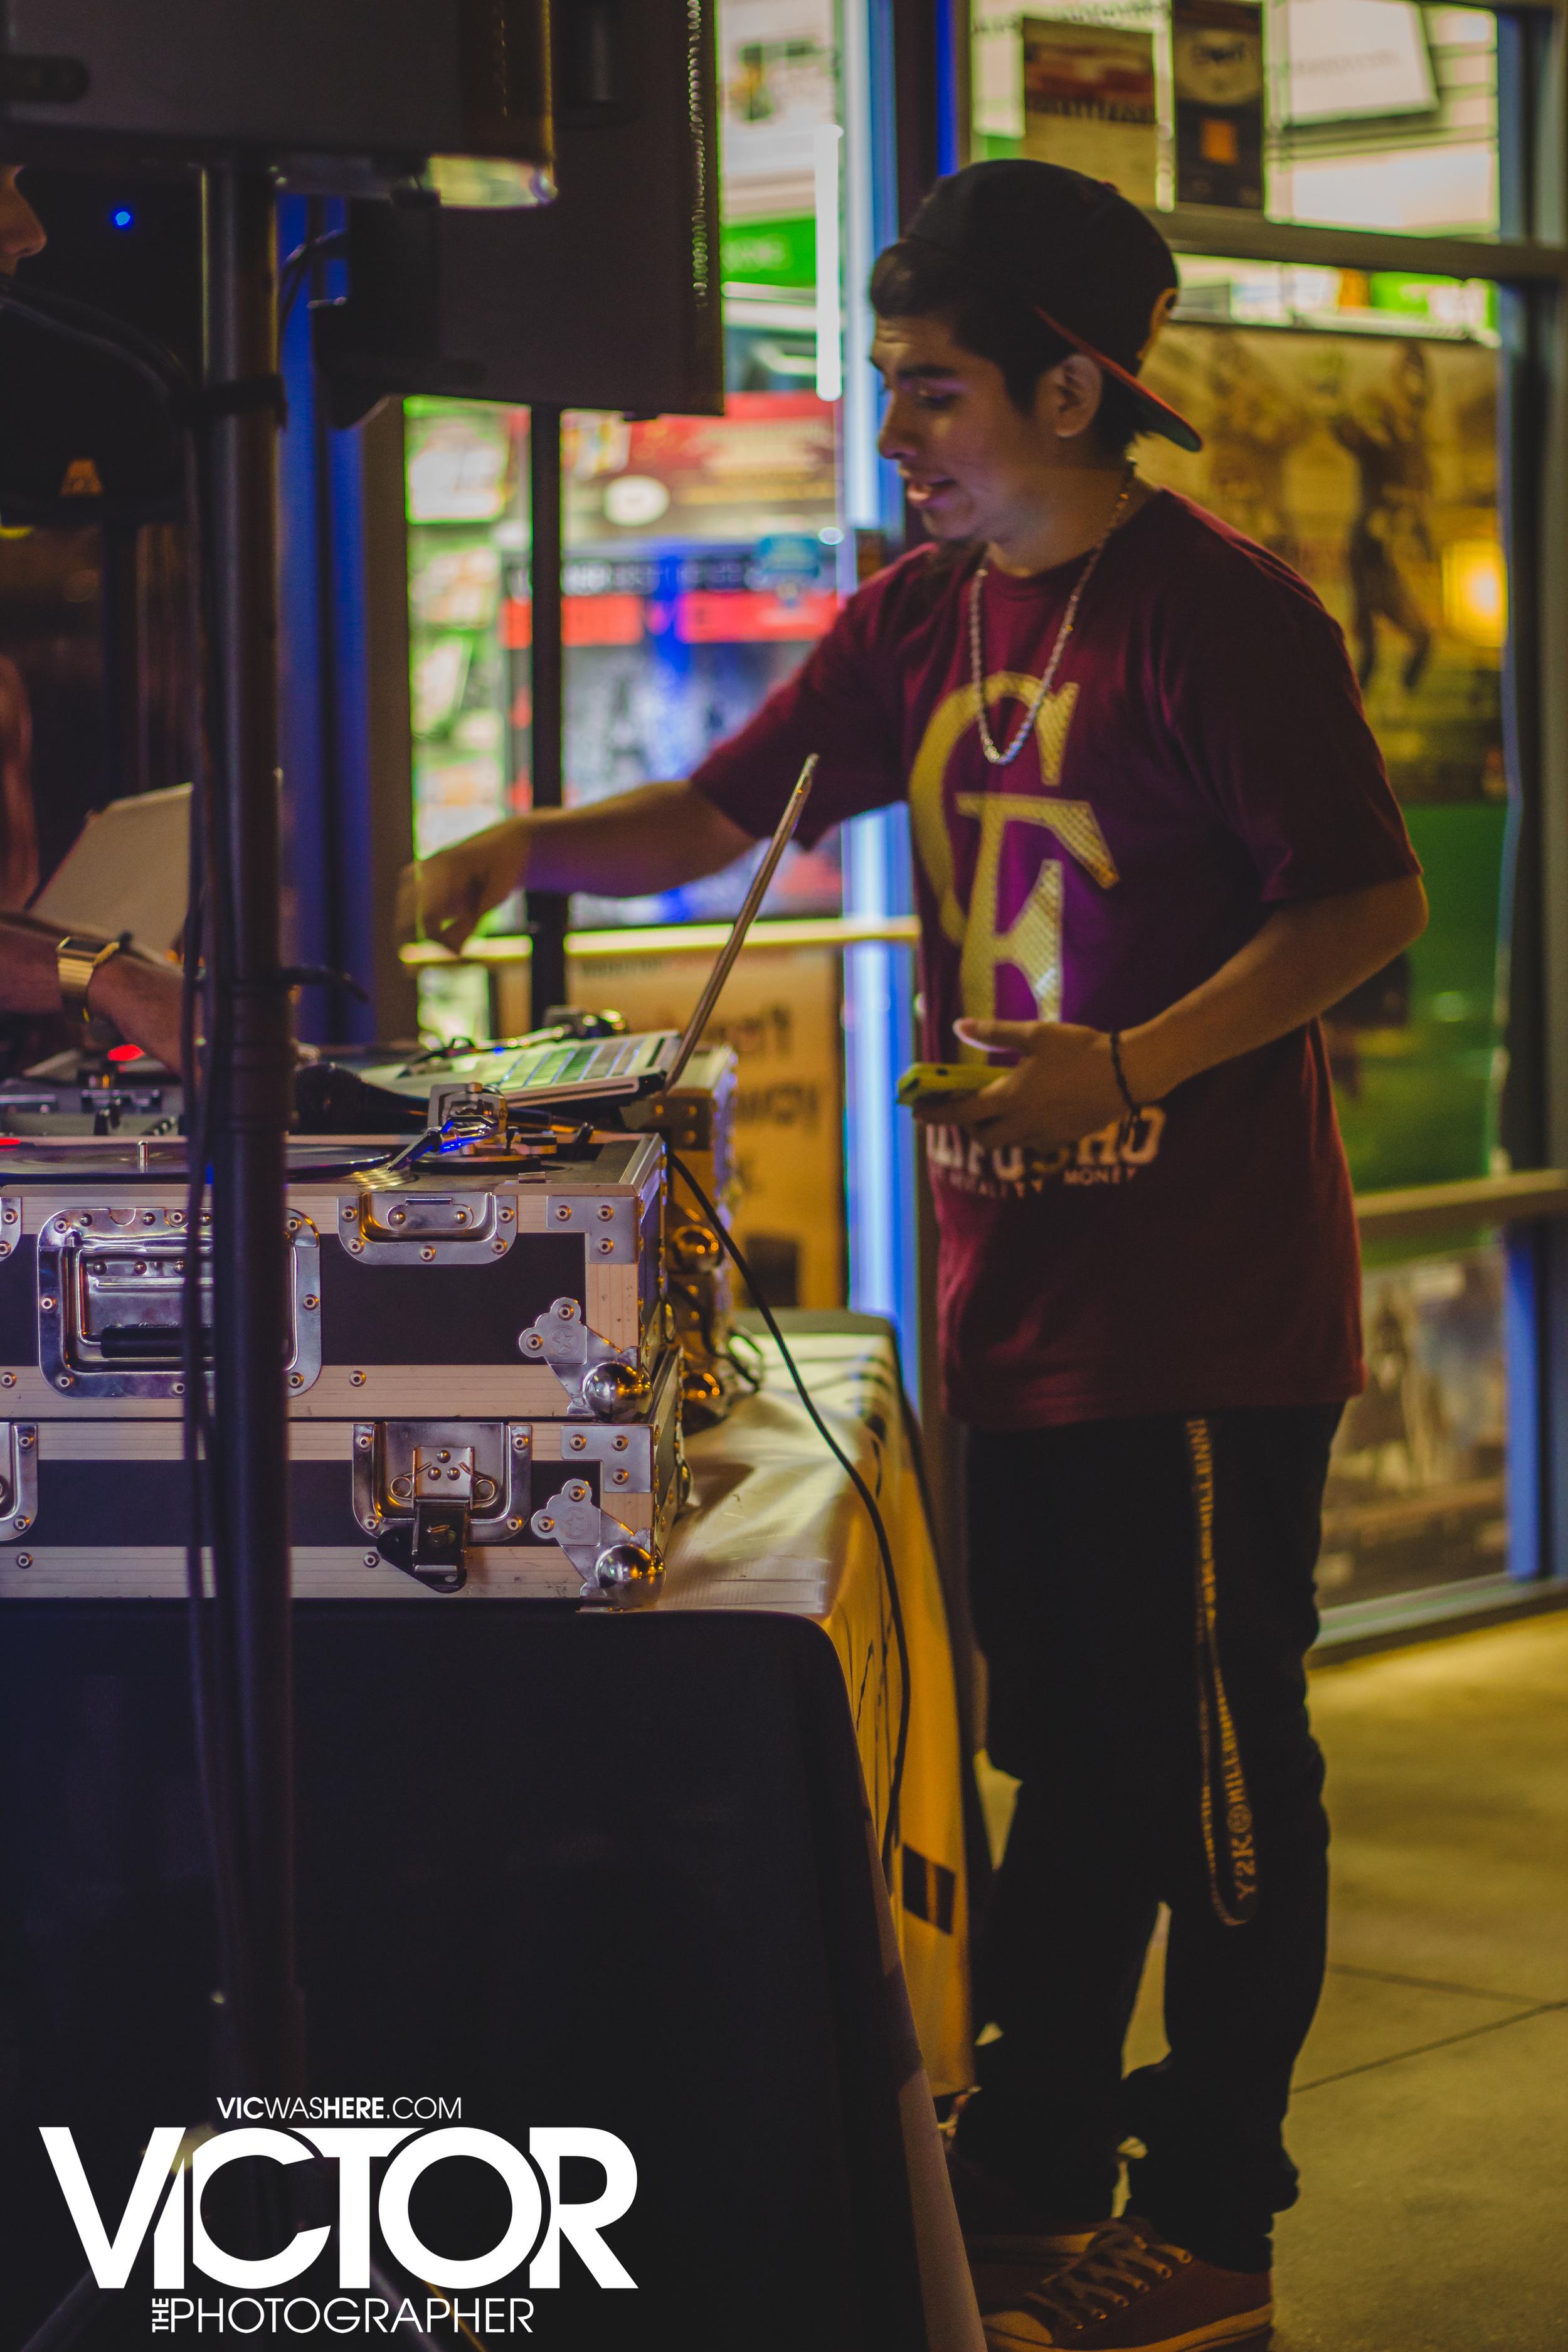 DJ VICTOR x TDUB ent x Victor The Photographer x VICWASHERE x Victor Escobar